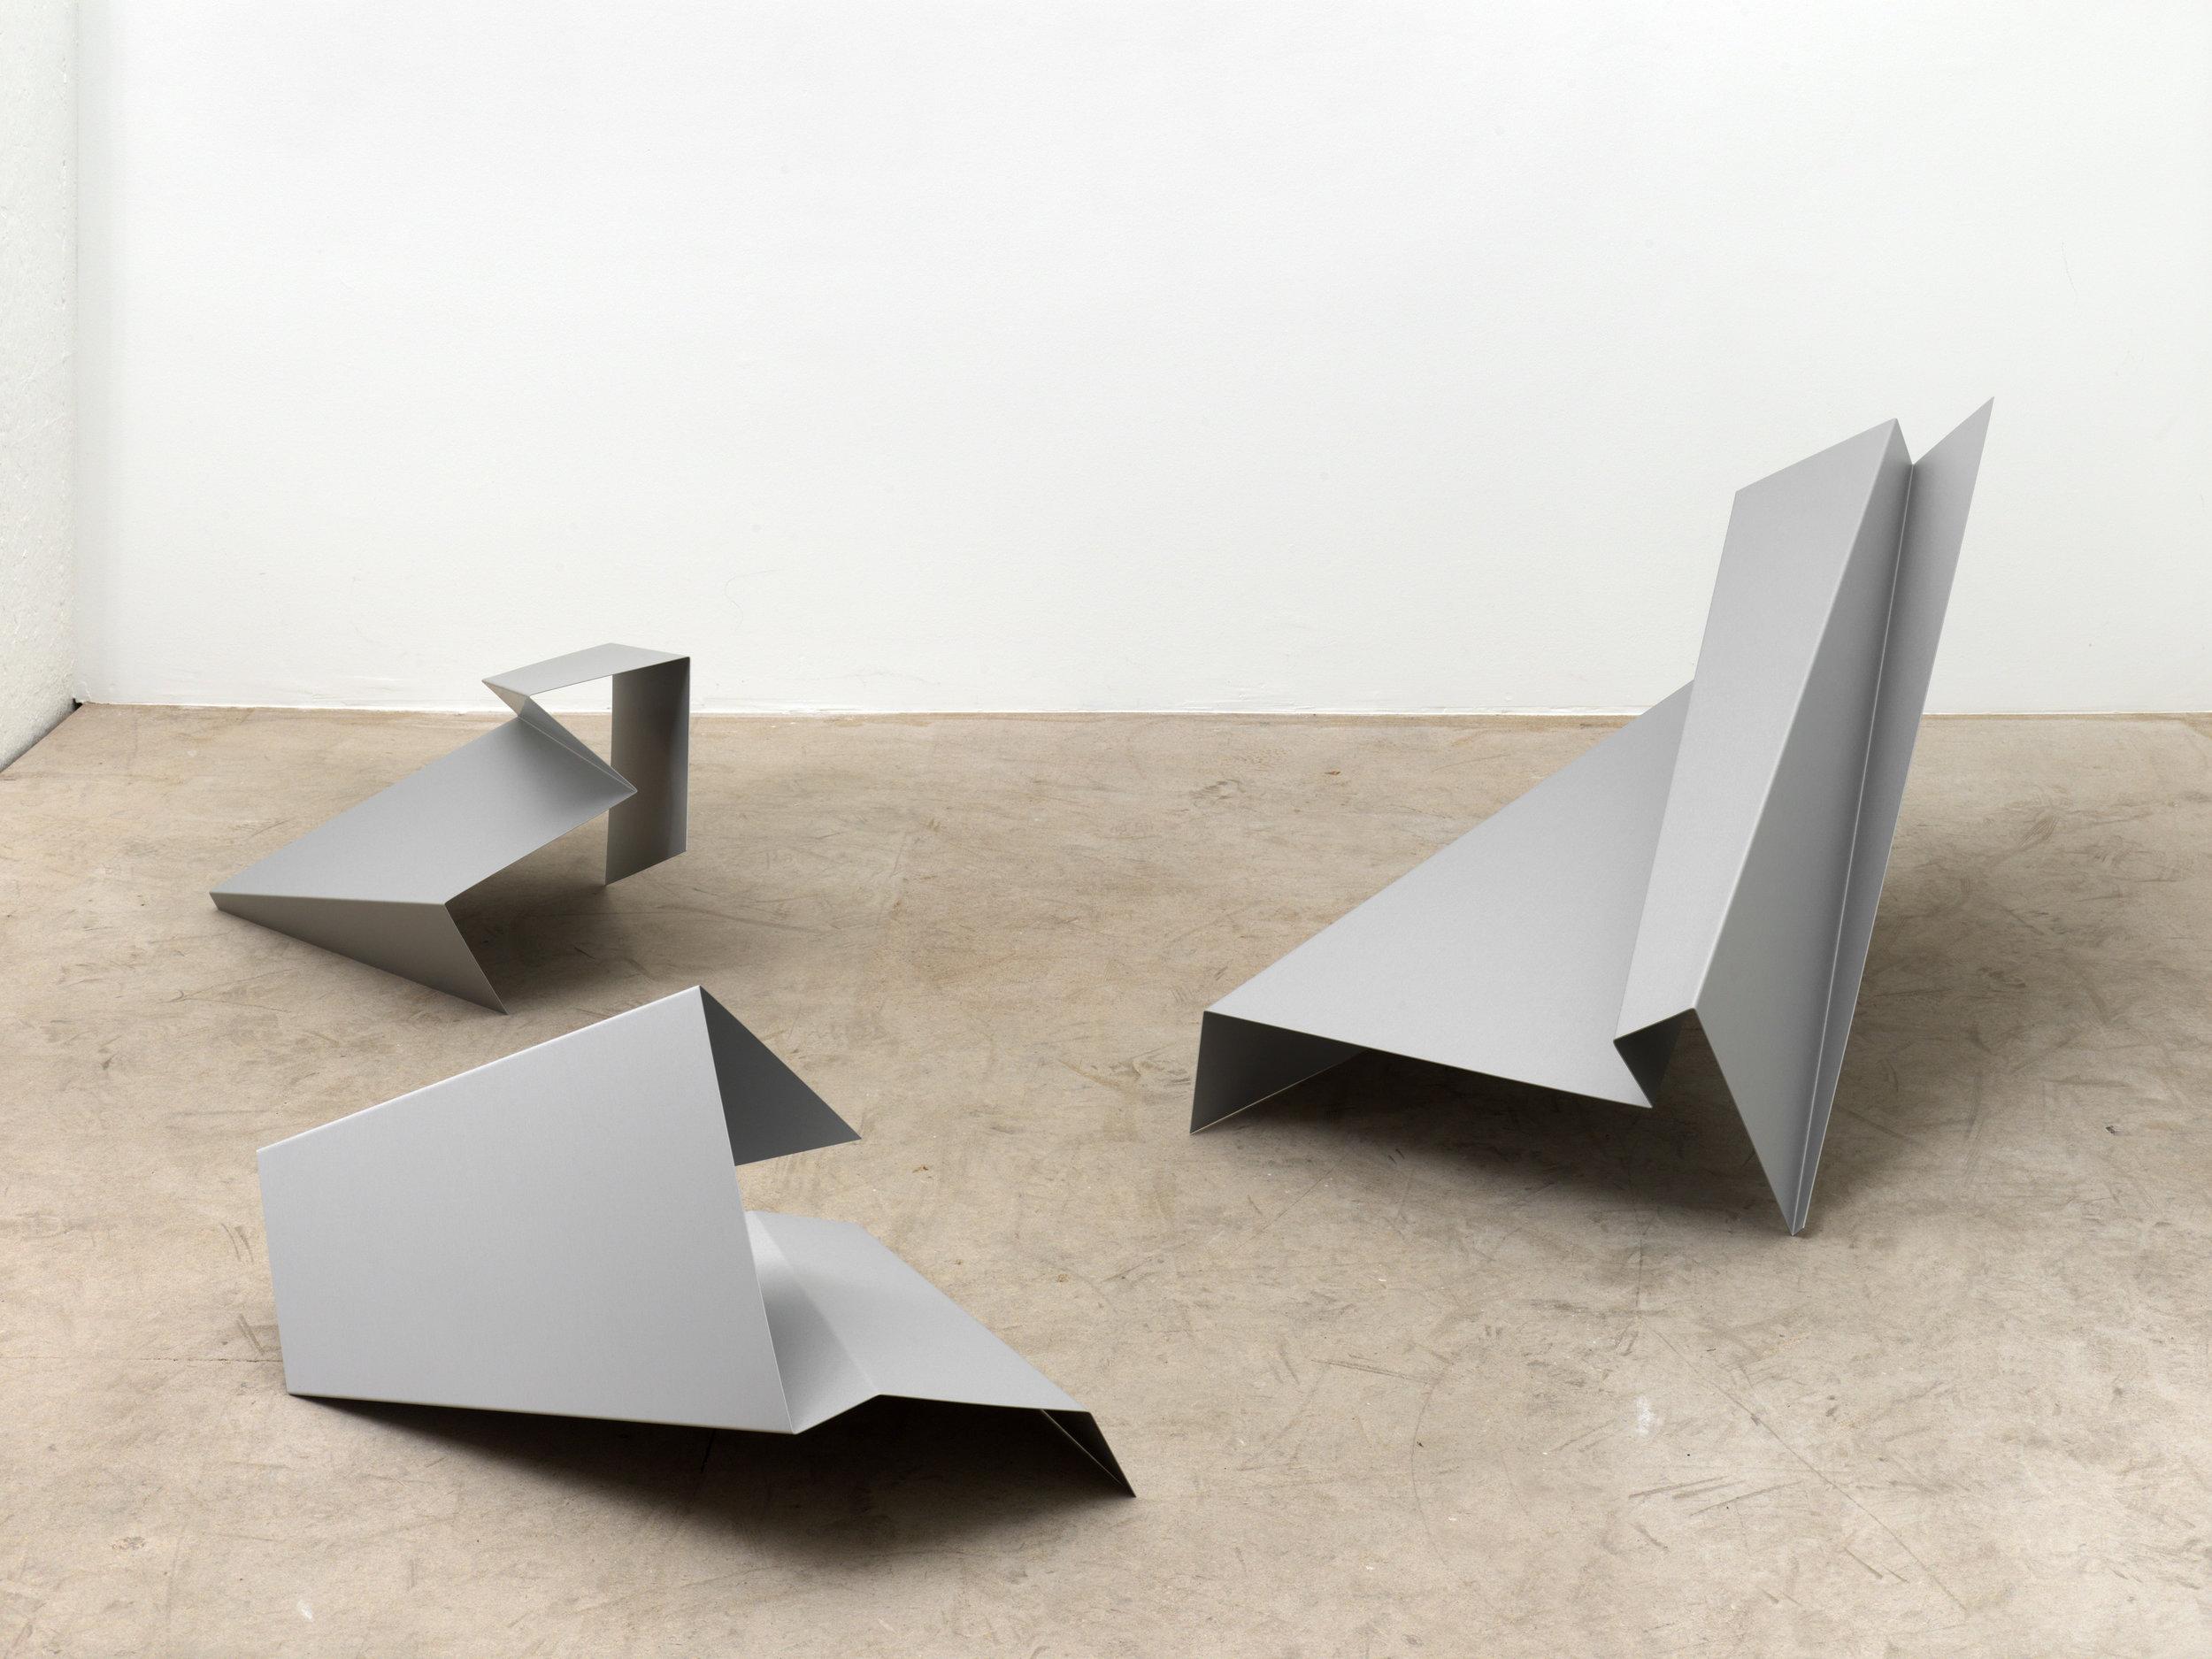 o.T., (untitled), 2006, Aluminium, anodized